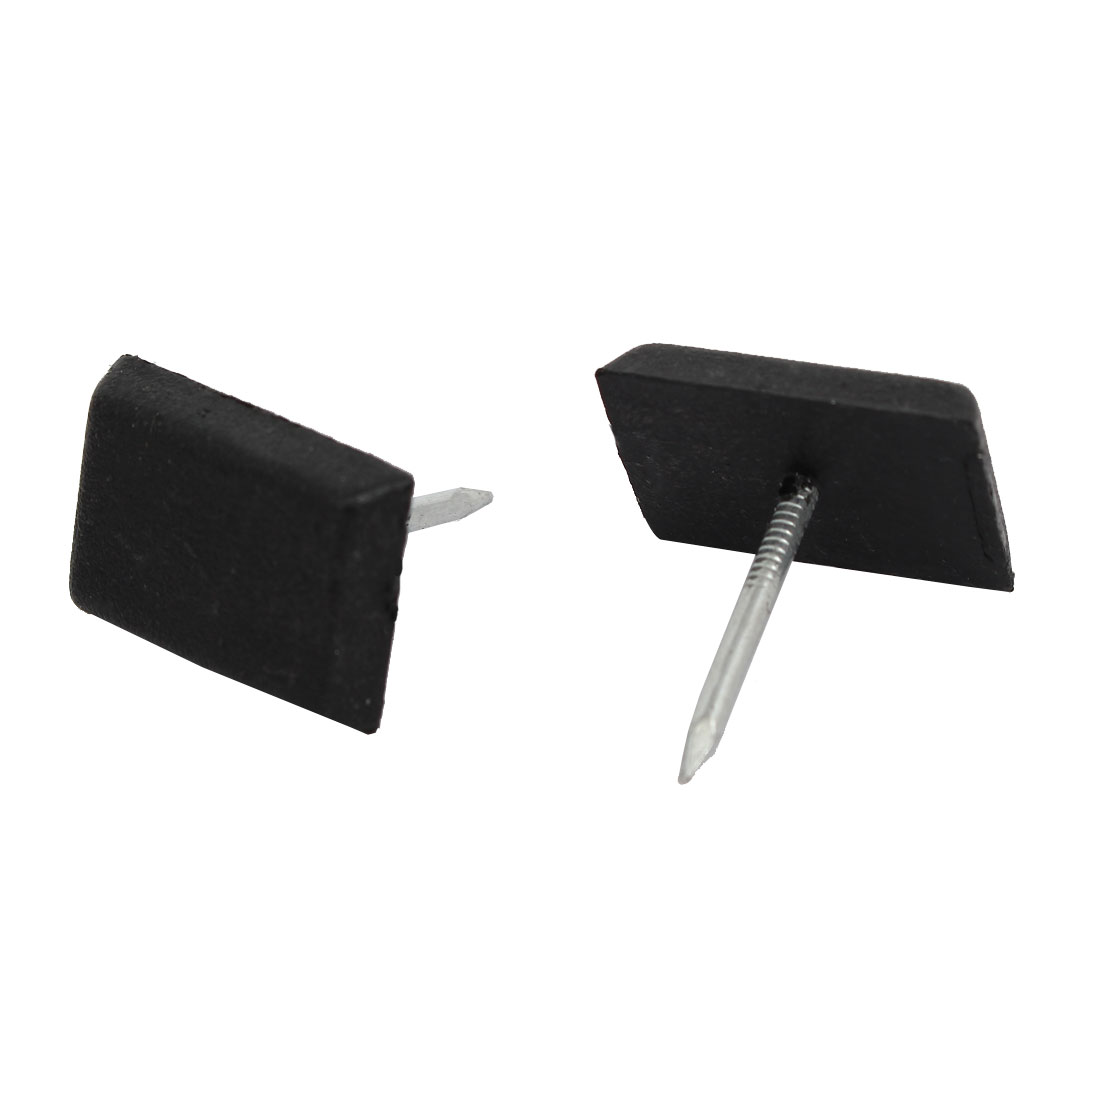 Unique BargainsWood Furniture Leg Foot Floor Protector Pad Glide Nails Black 18mm x 12mm 30PCS - image 2 of 3